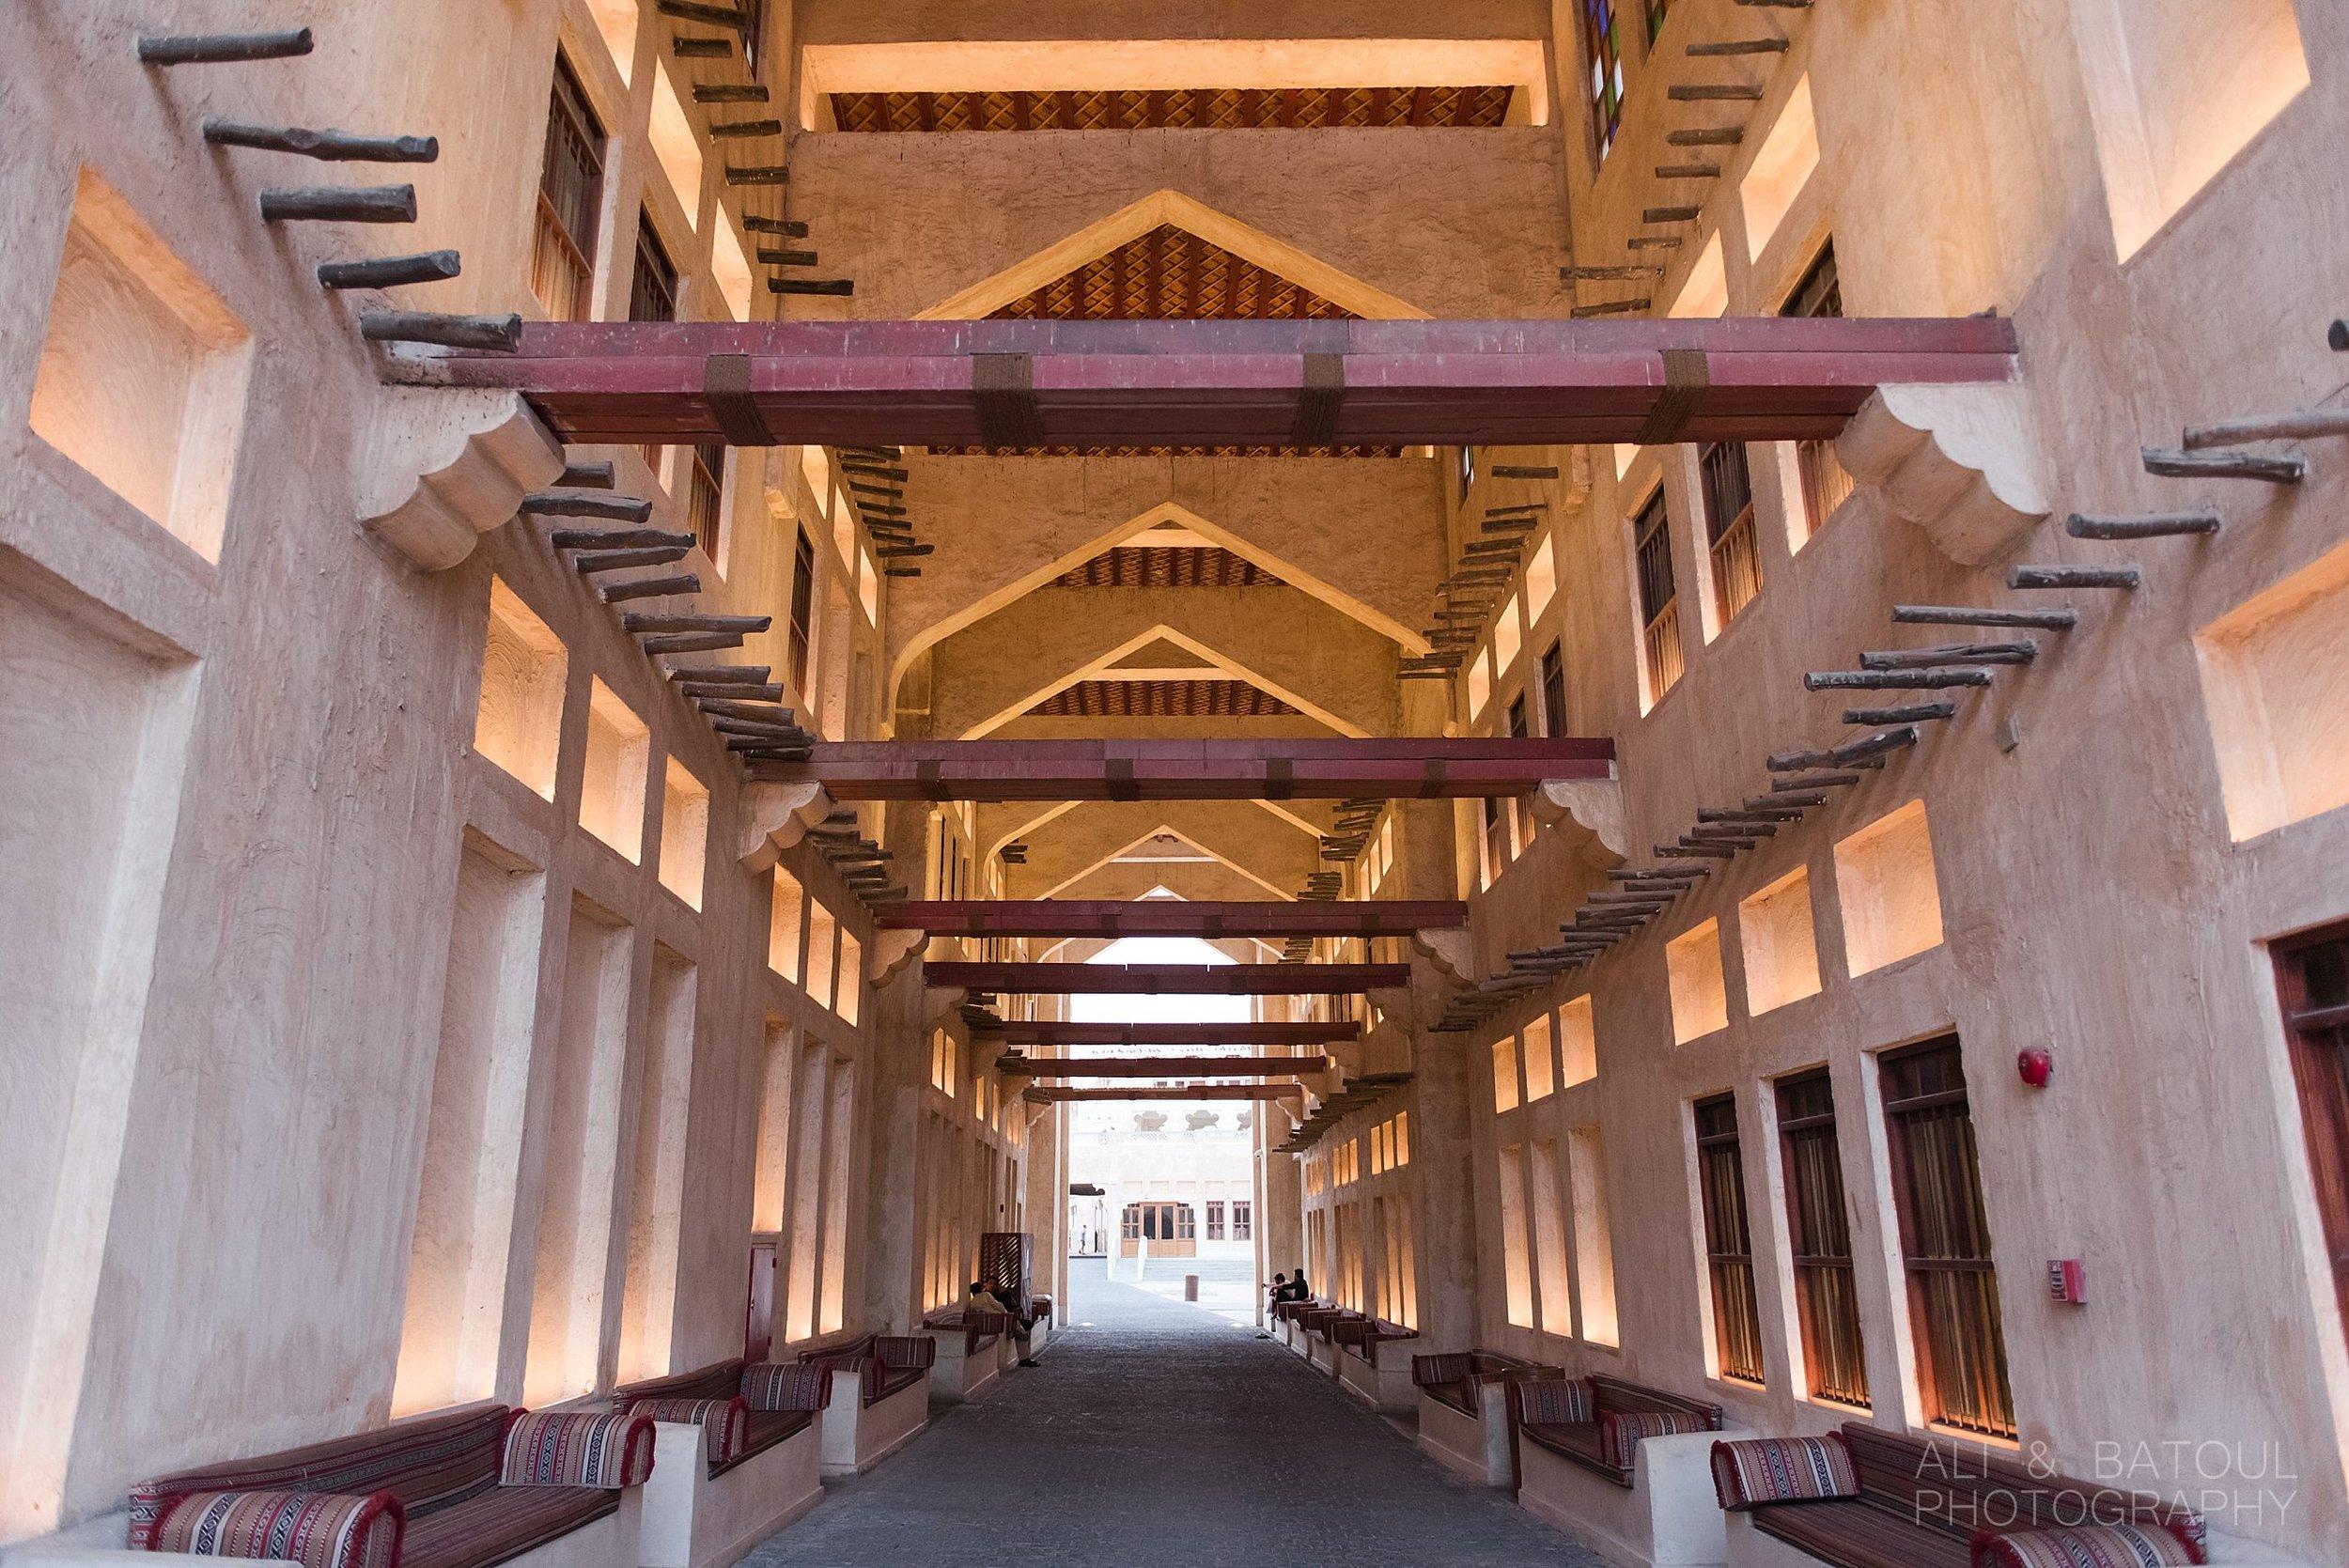 Ali & Batoul Photography - Doha Travel Photography_0021.jpg